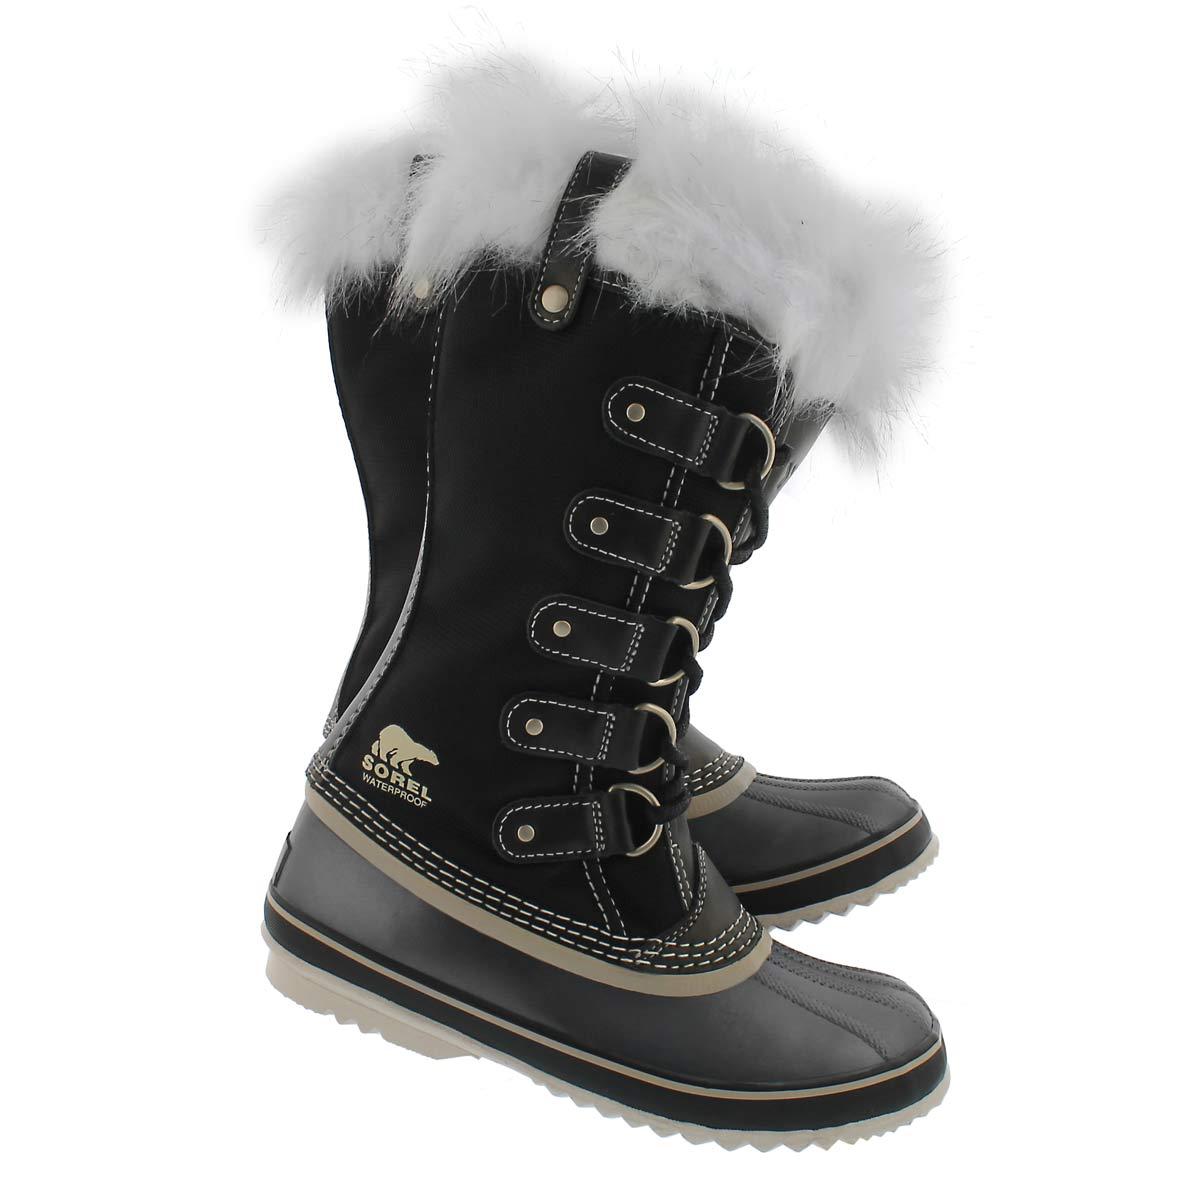 Lds Joan of Arctic X blk wpf winter boot